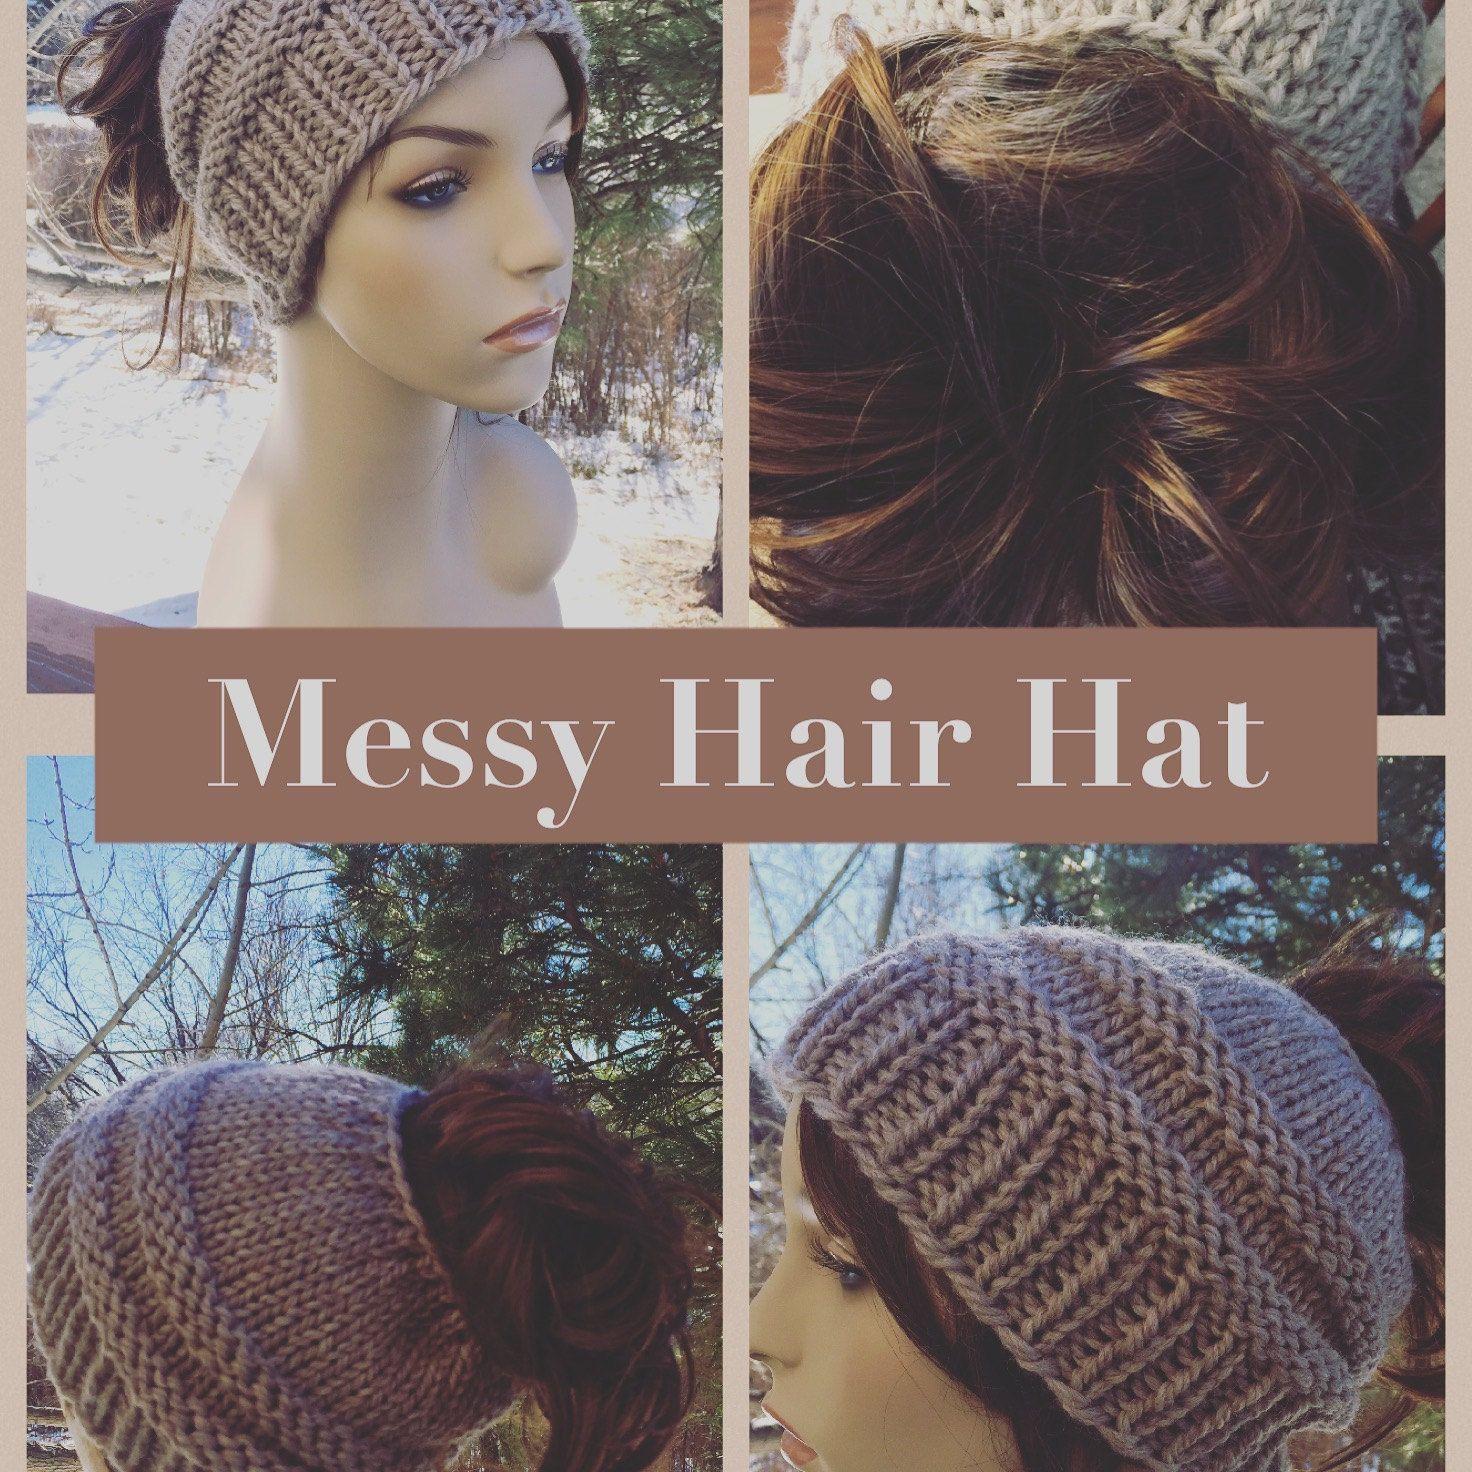 Knitted messy bun hat knit hat bun hat knit hat pattern knitted messy bun hat knit hat bun hat knit hat pattern knitting bankloansurffo Images